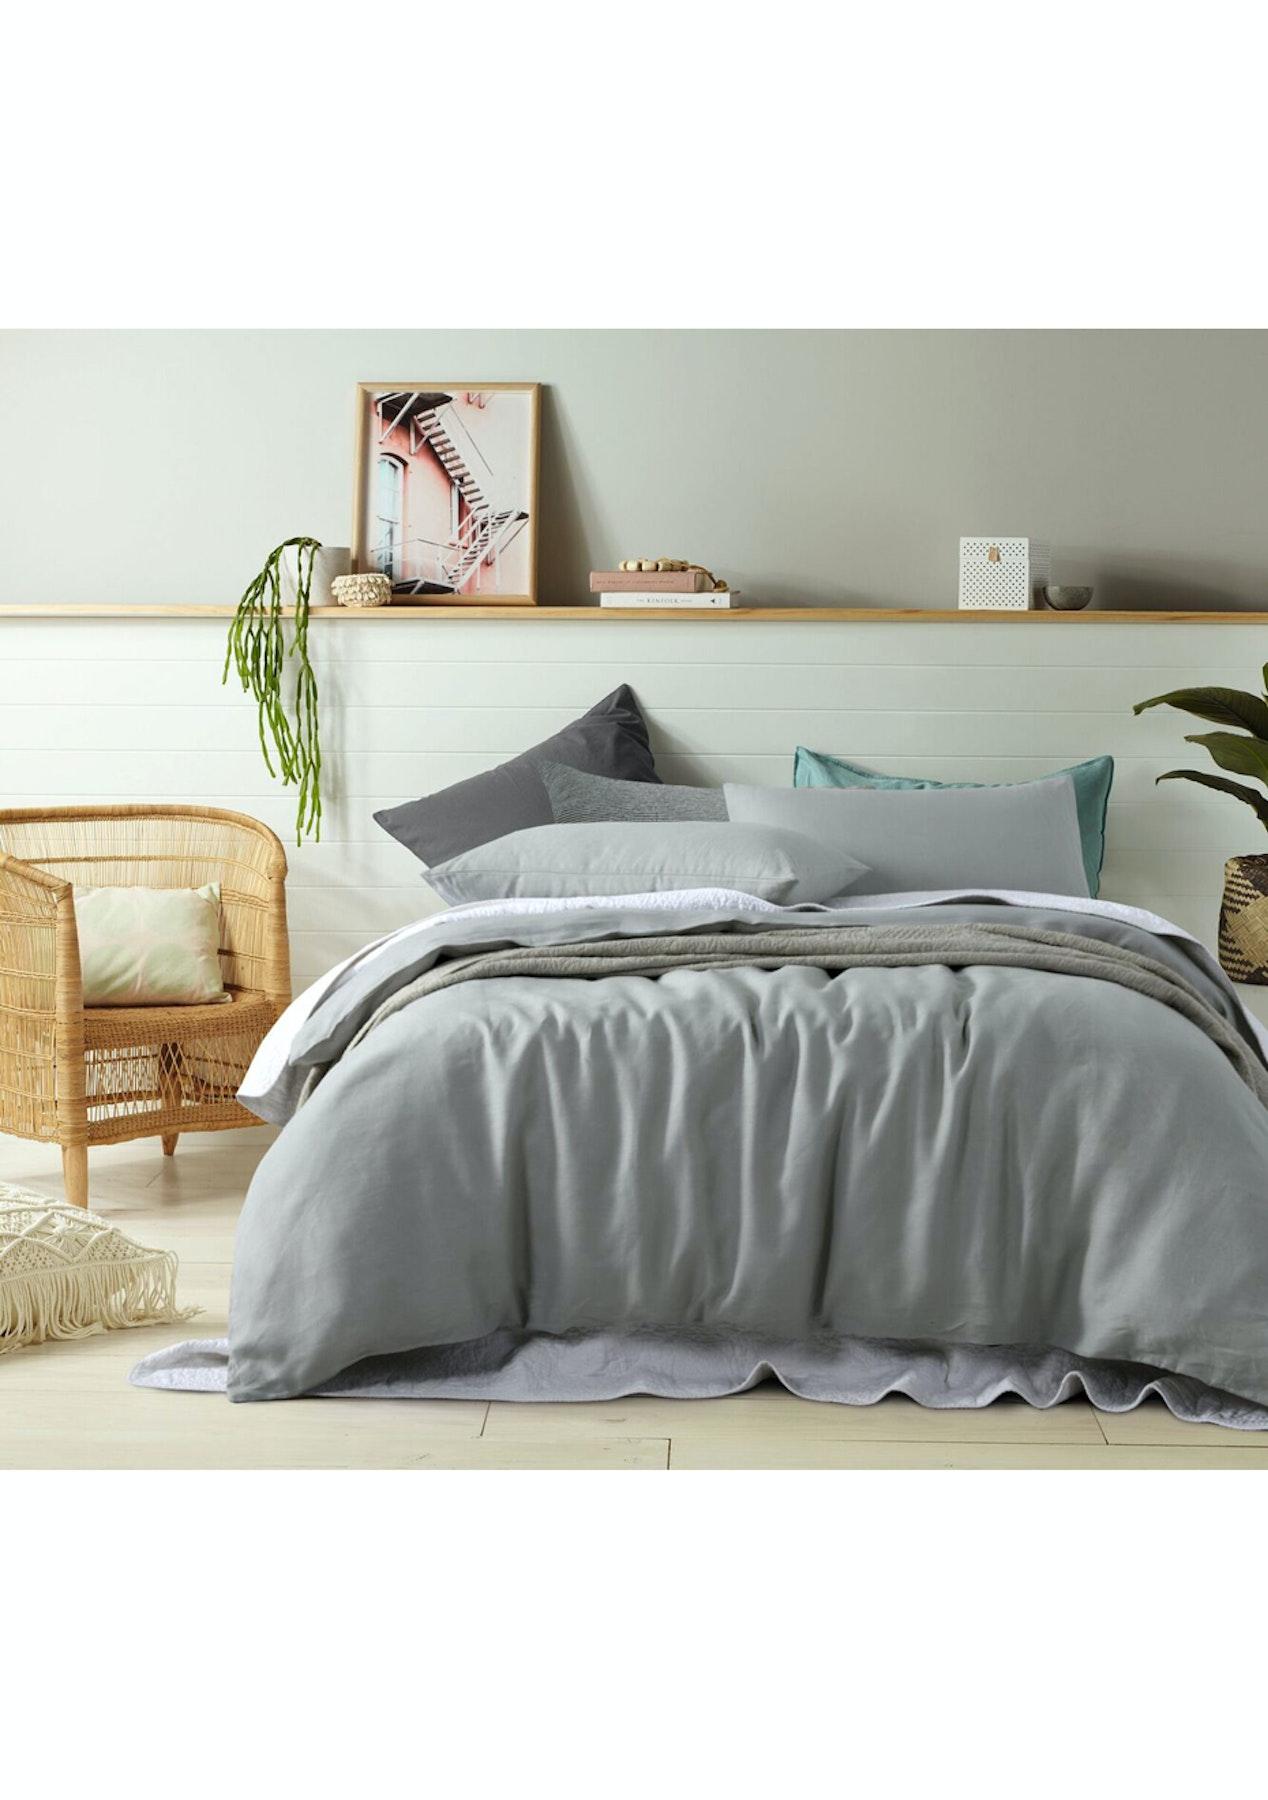 duvet quantiply ikea twin check decor grey co covers linen cover inside